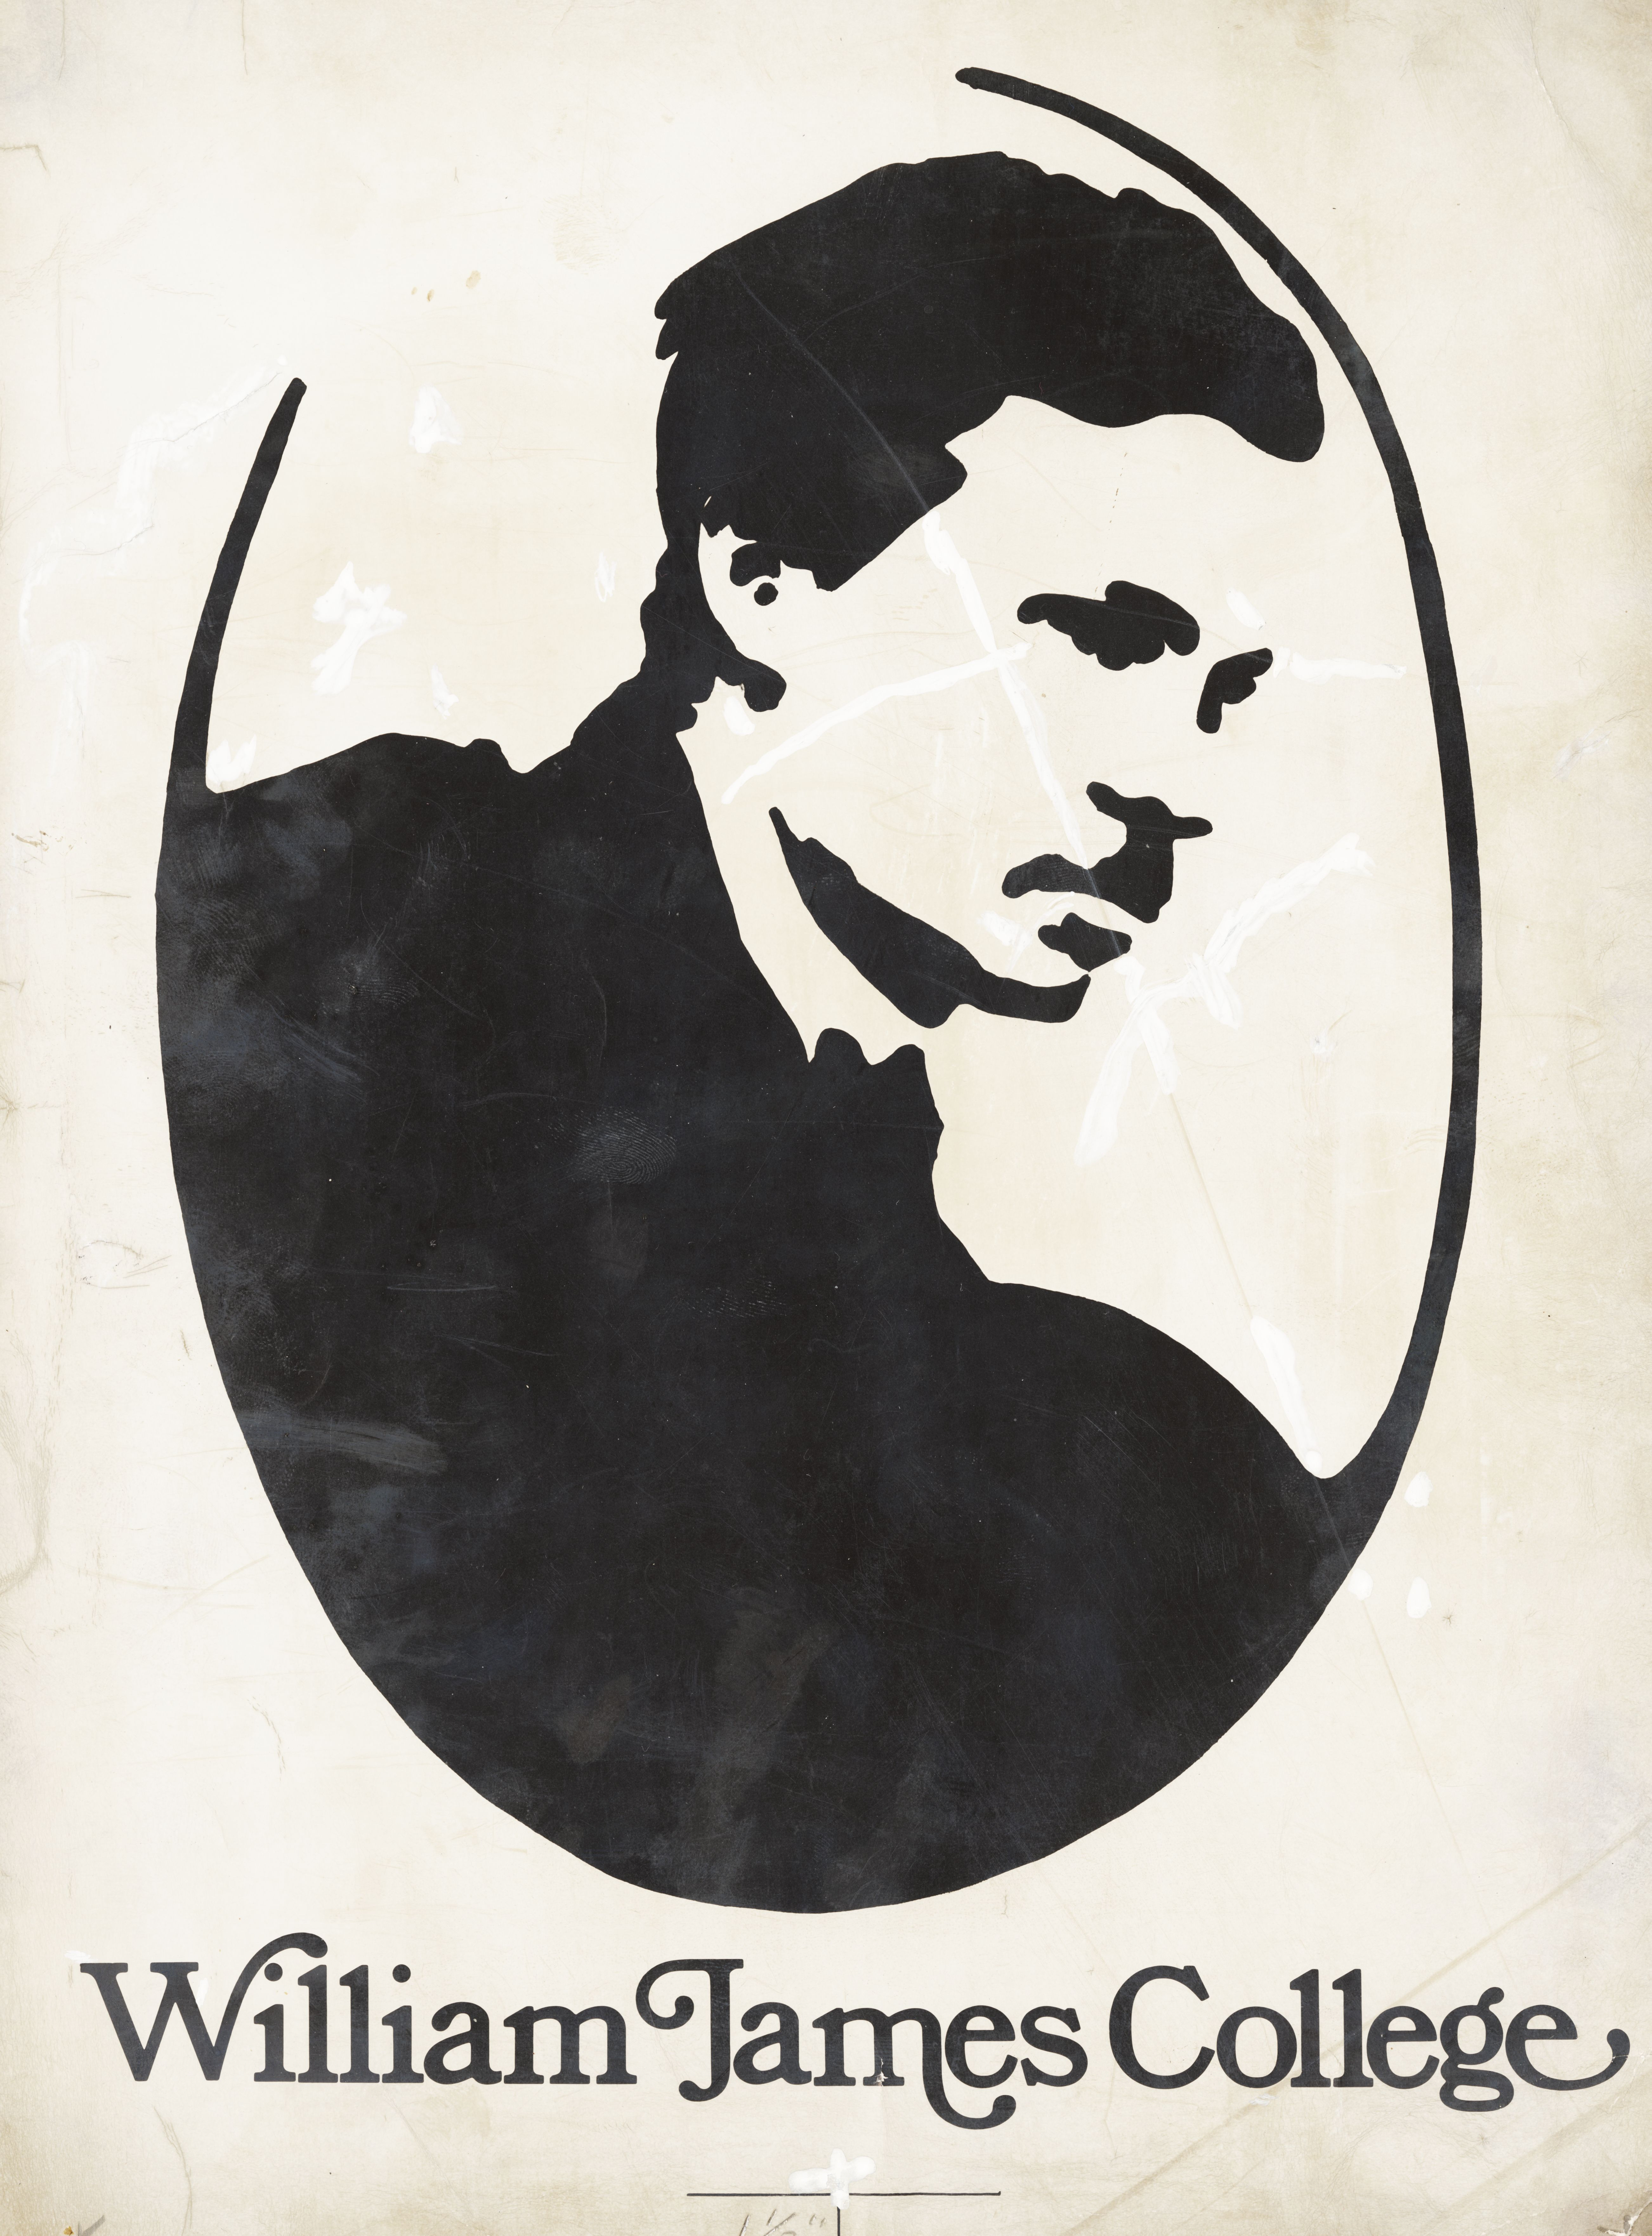 WJ-College-logo